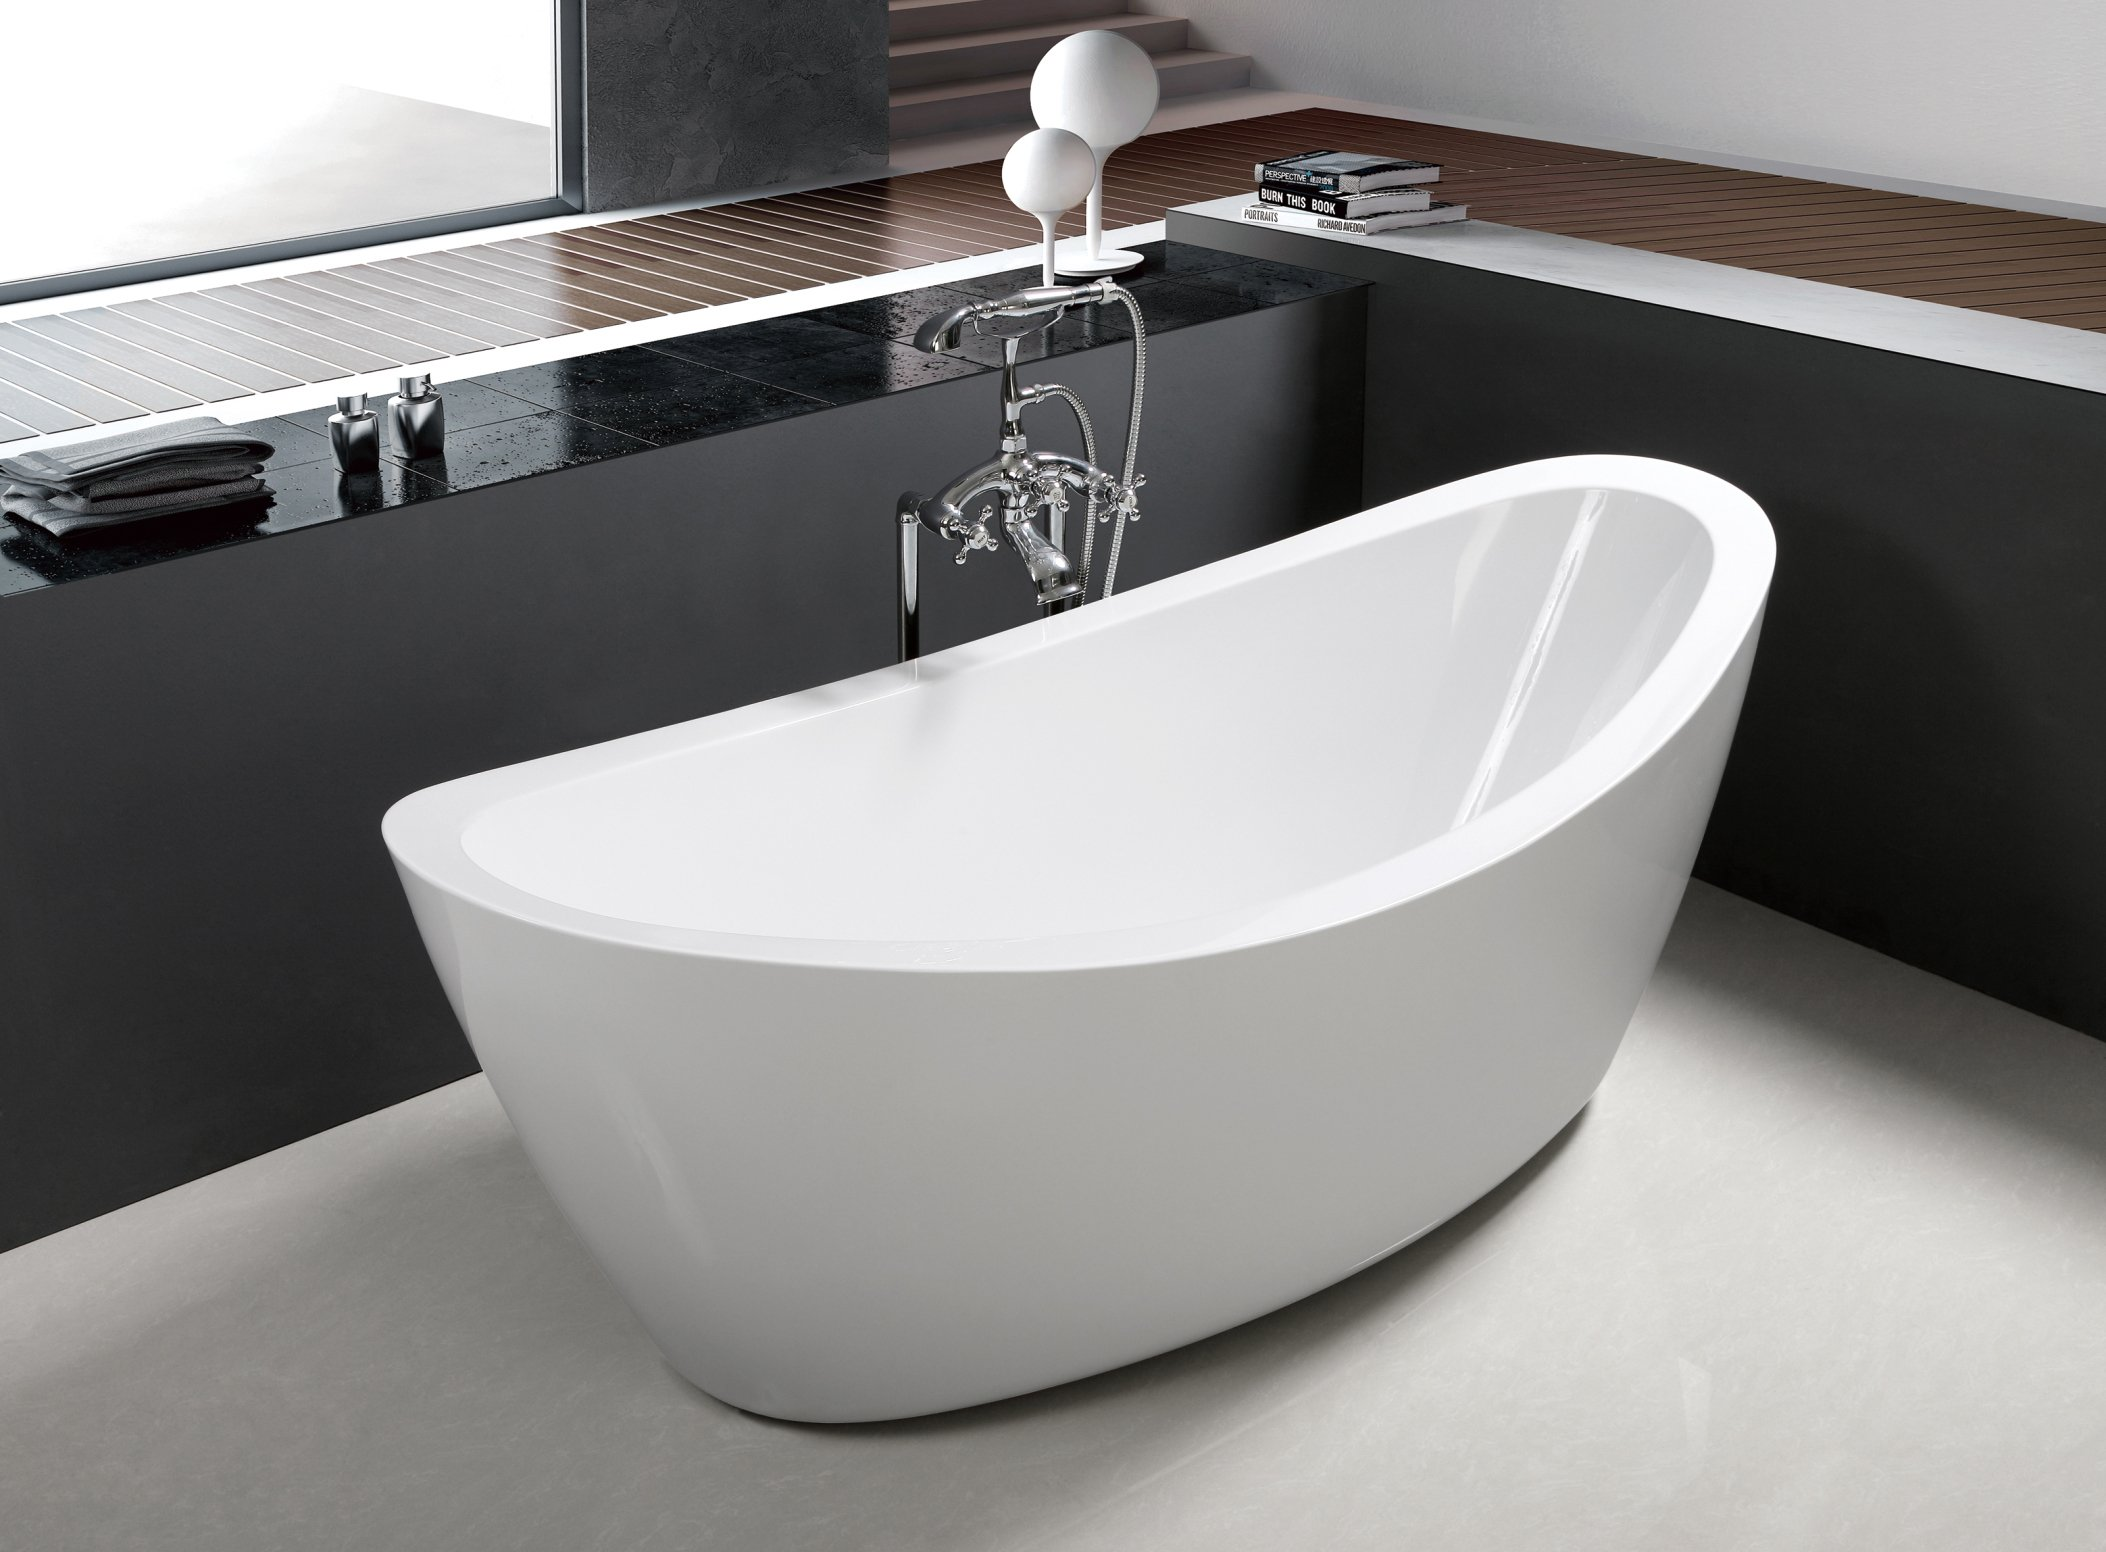 71'' Freestanding Luxury Bathtub White Acrylic